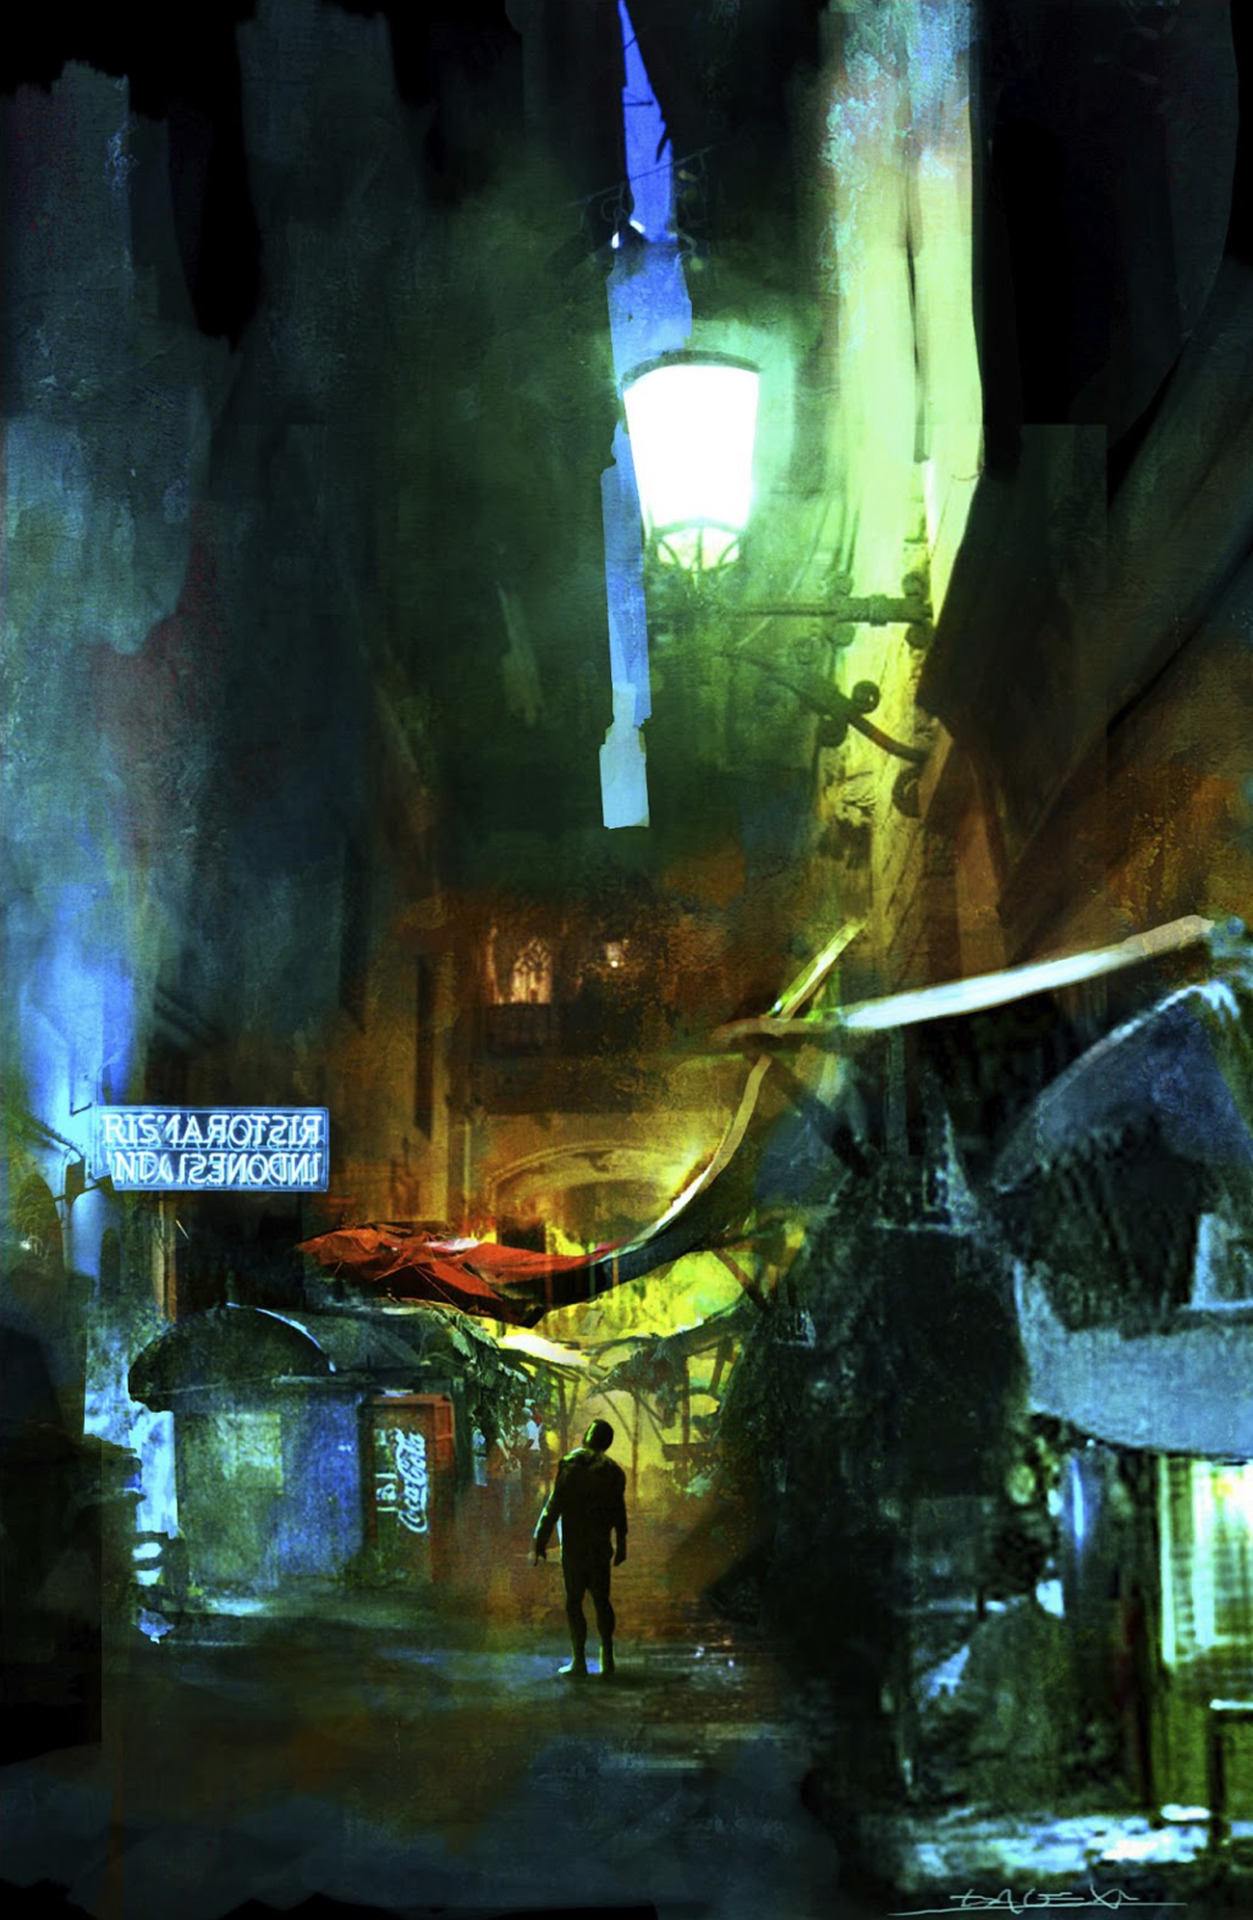 Alessandro Taini - Cyberpunk Alley